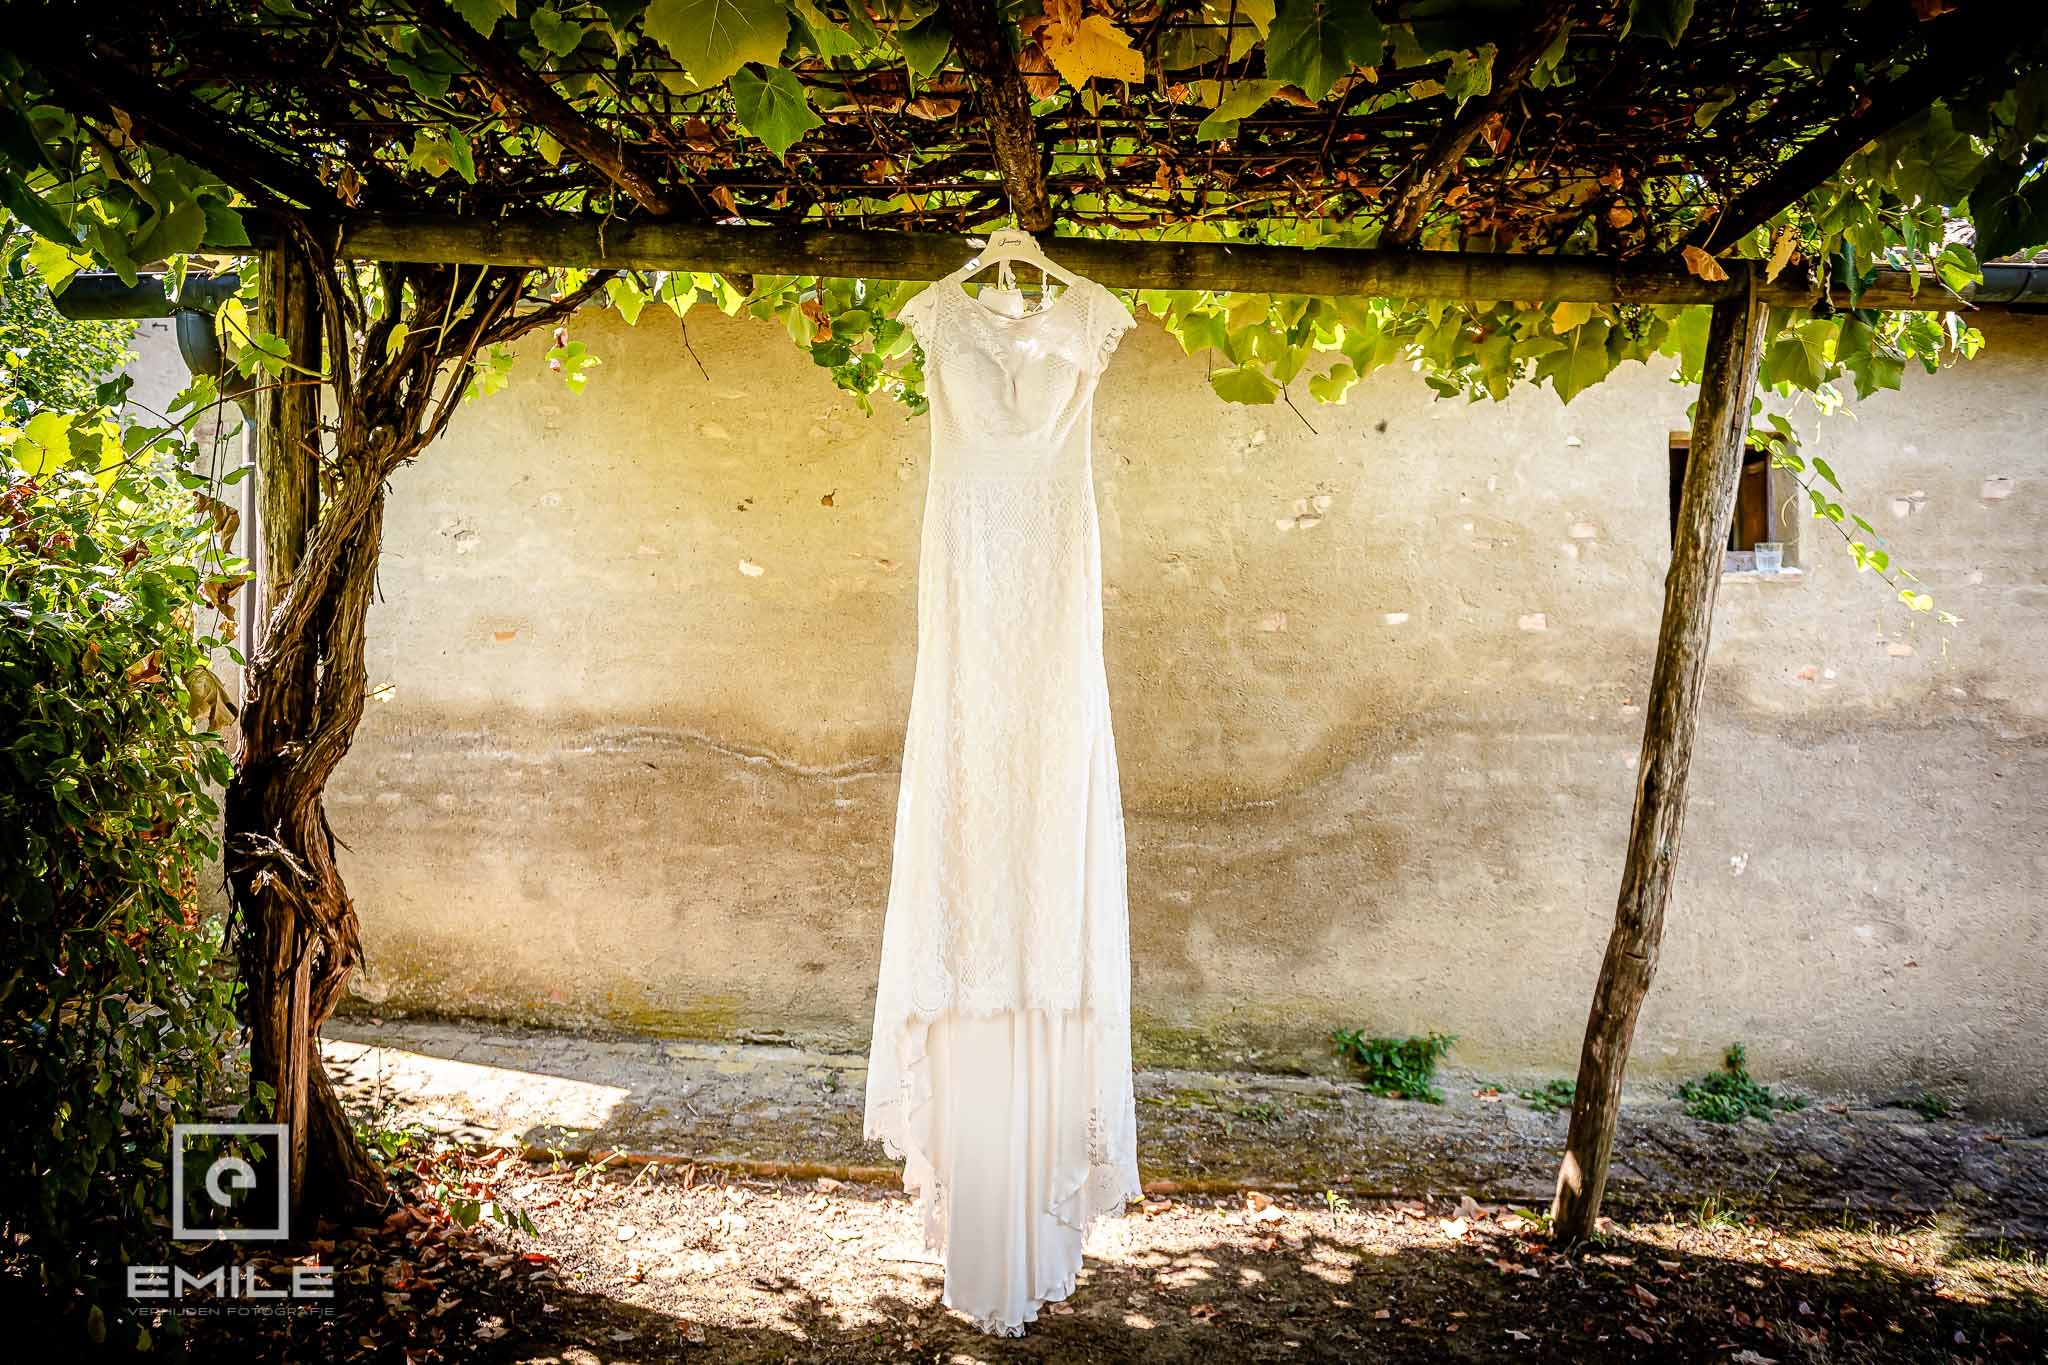 De bruidsjurk mag worden gefotografeerd - Destination wedding San Gimignano - Toscane Italie - Iris en Job